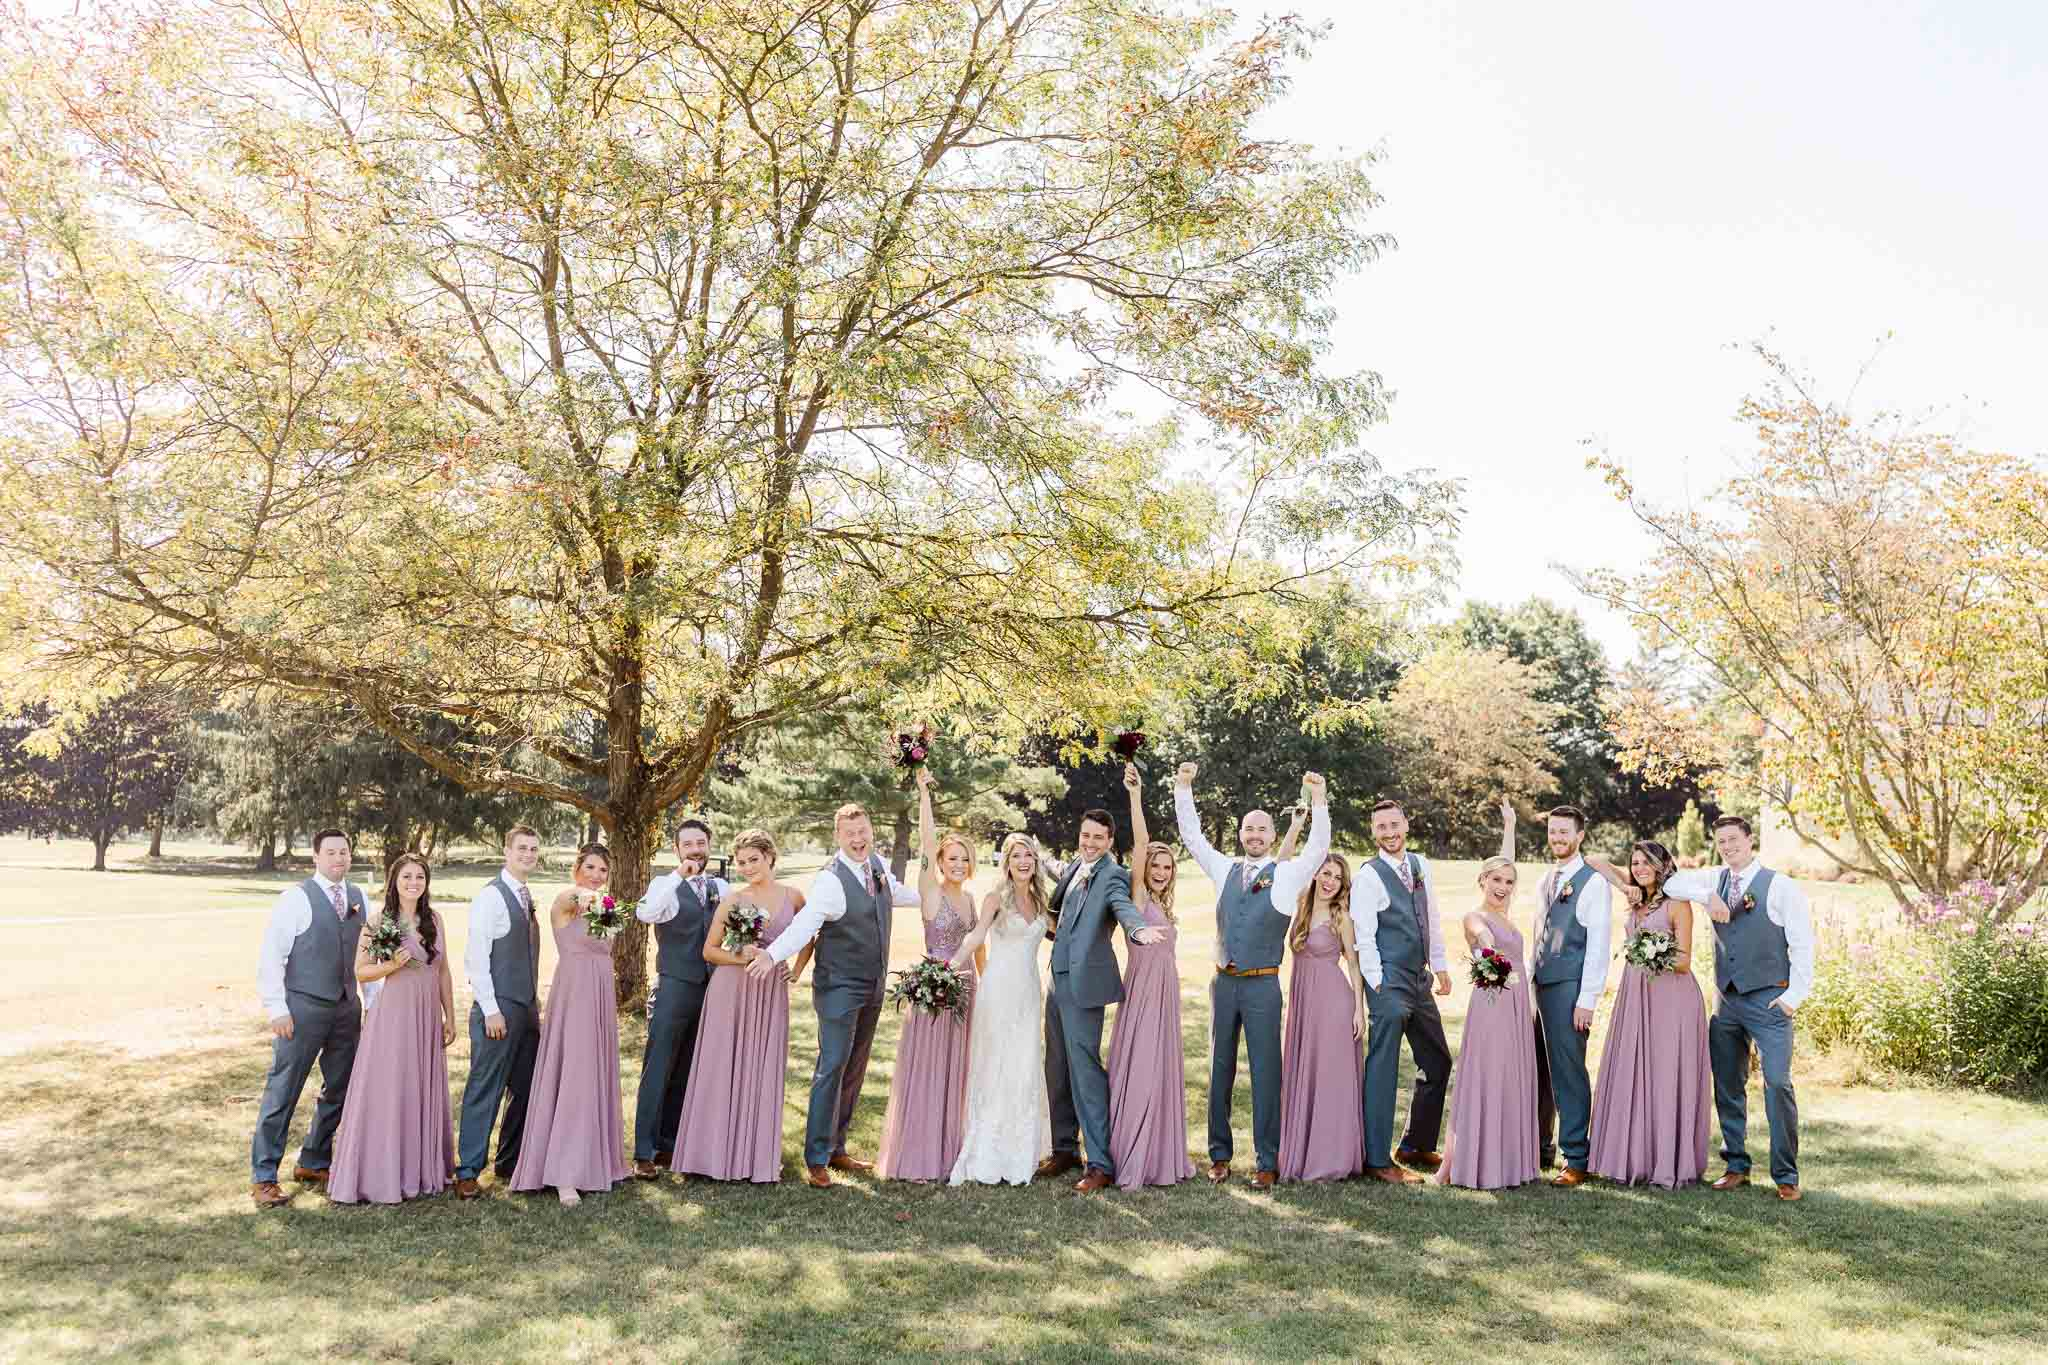 Frosty-Valley-September-Wedding-7436.jpg